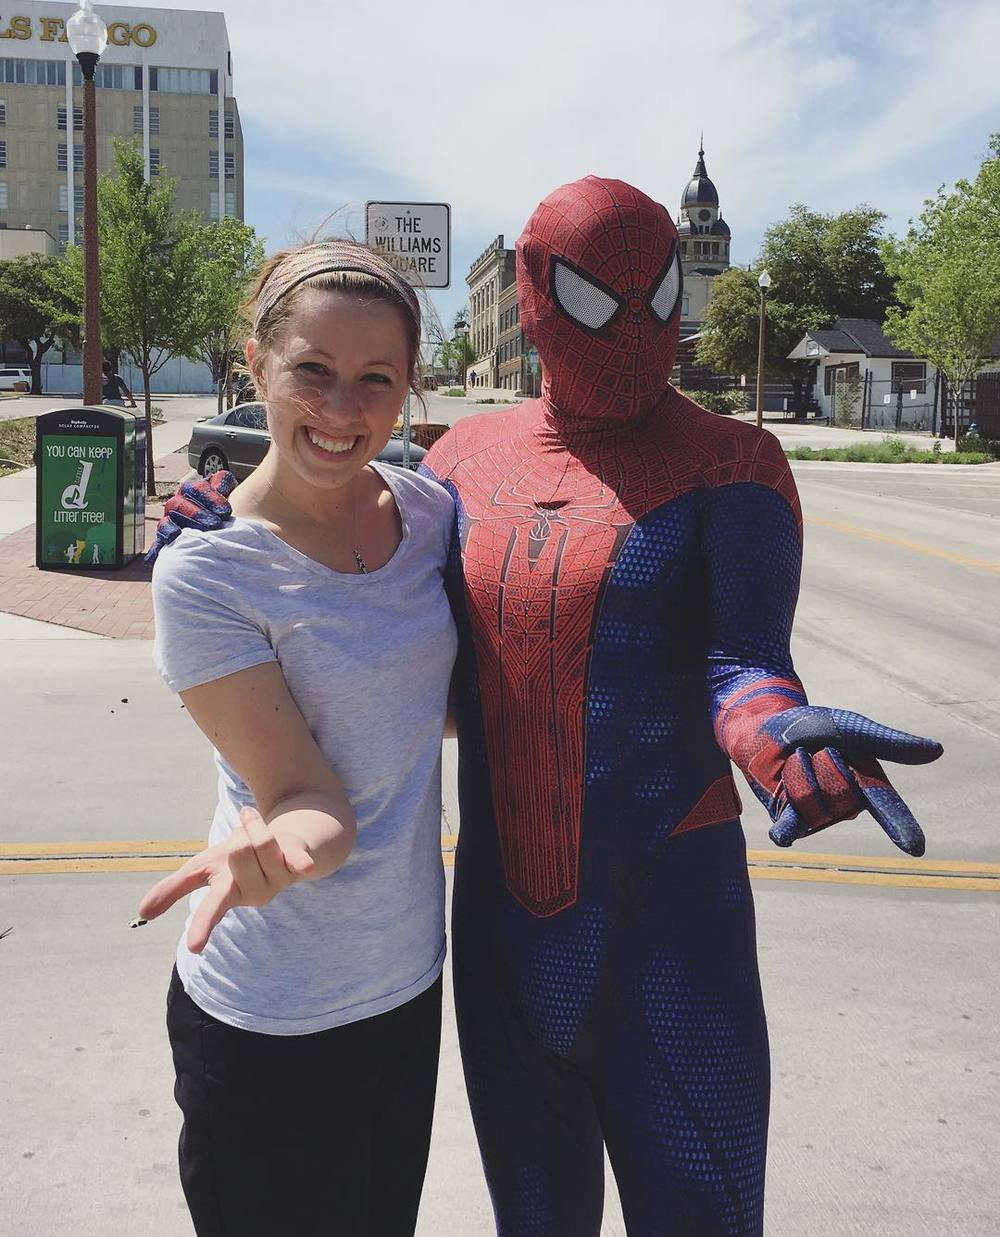 @lmaeguuula73 is on Spiderman's side for Civil War.